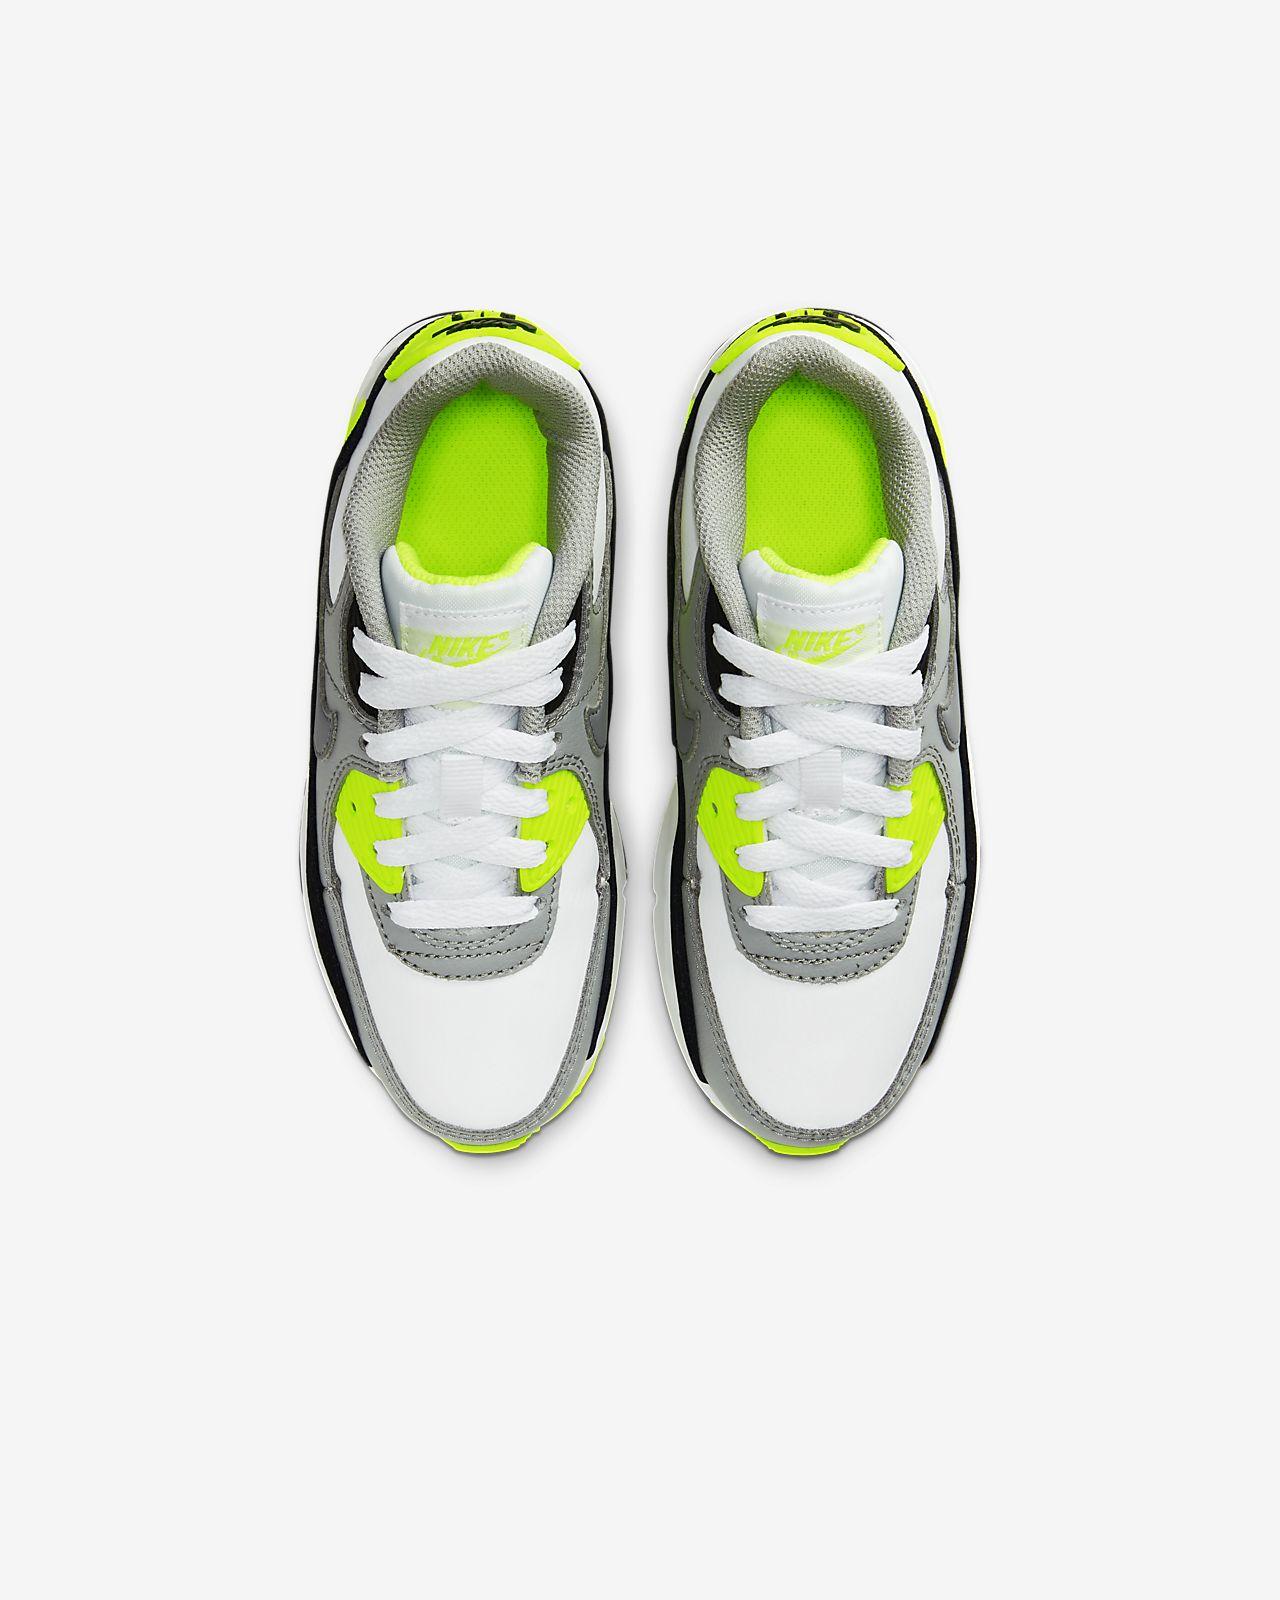 Nike Air Max 90 sko til små børn